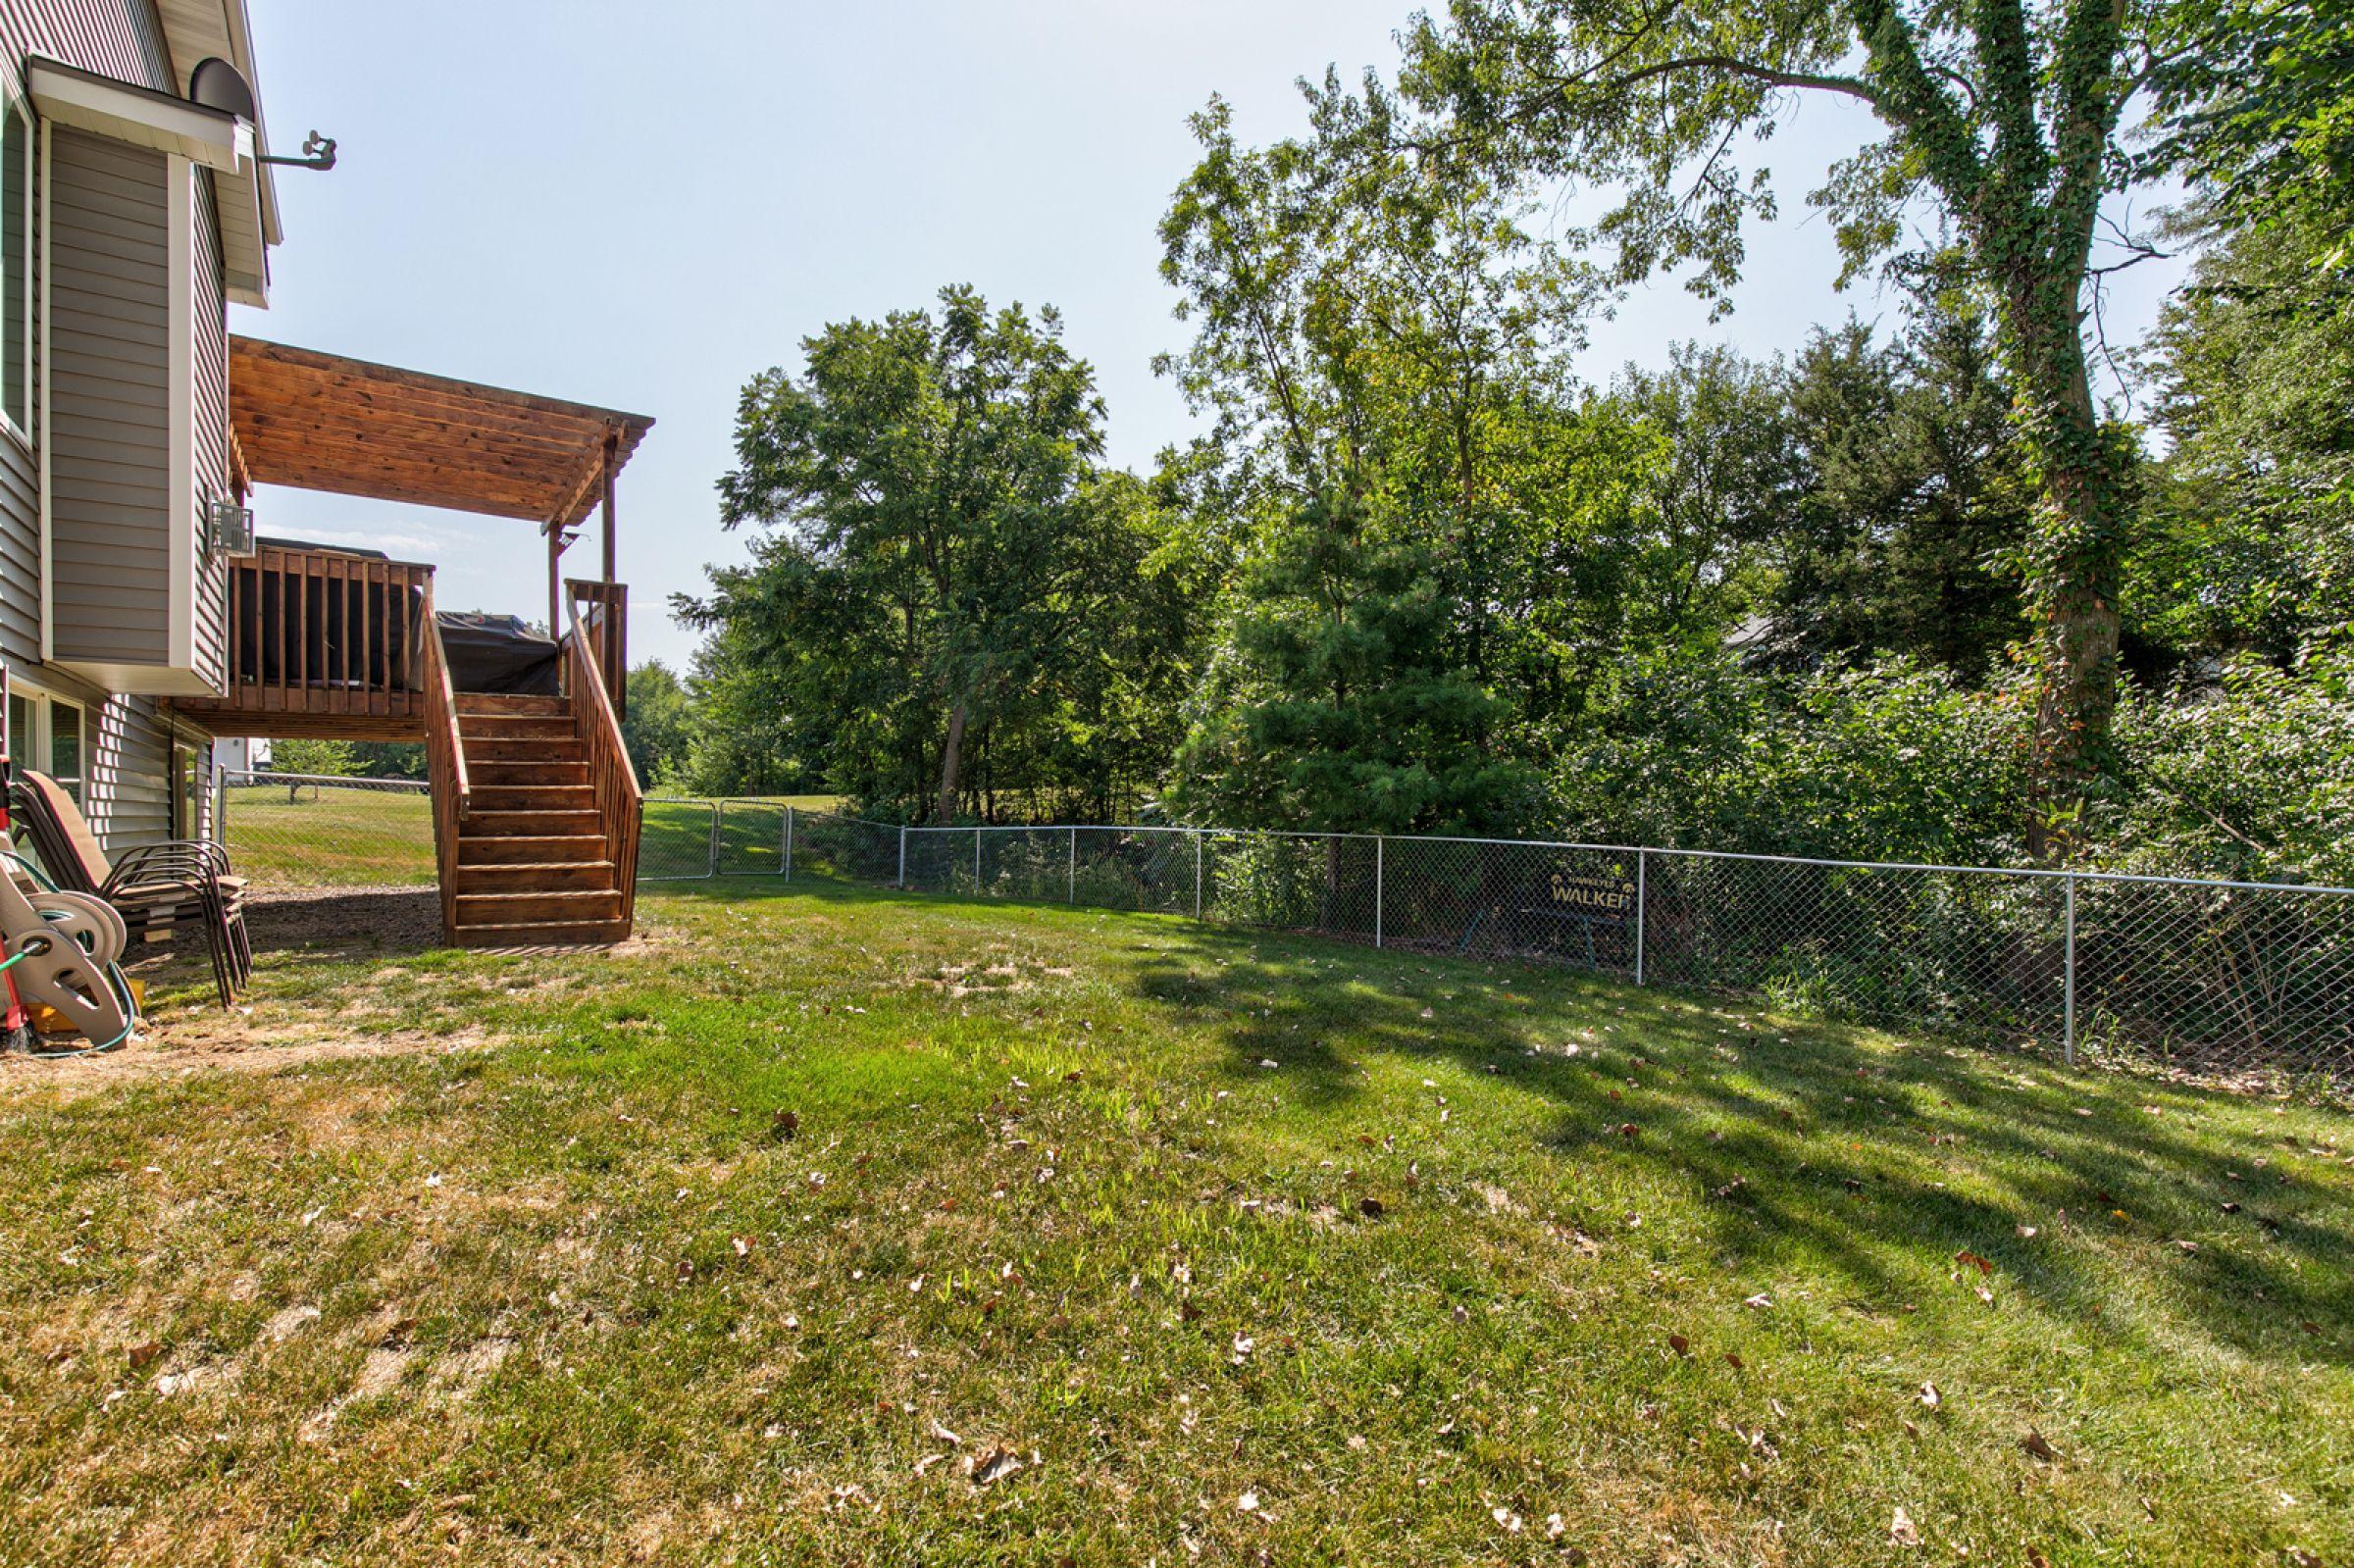 residential-warren-county-iowa-0-acres-listing-number-15685-2-2021-08-31-032507.jpg